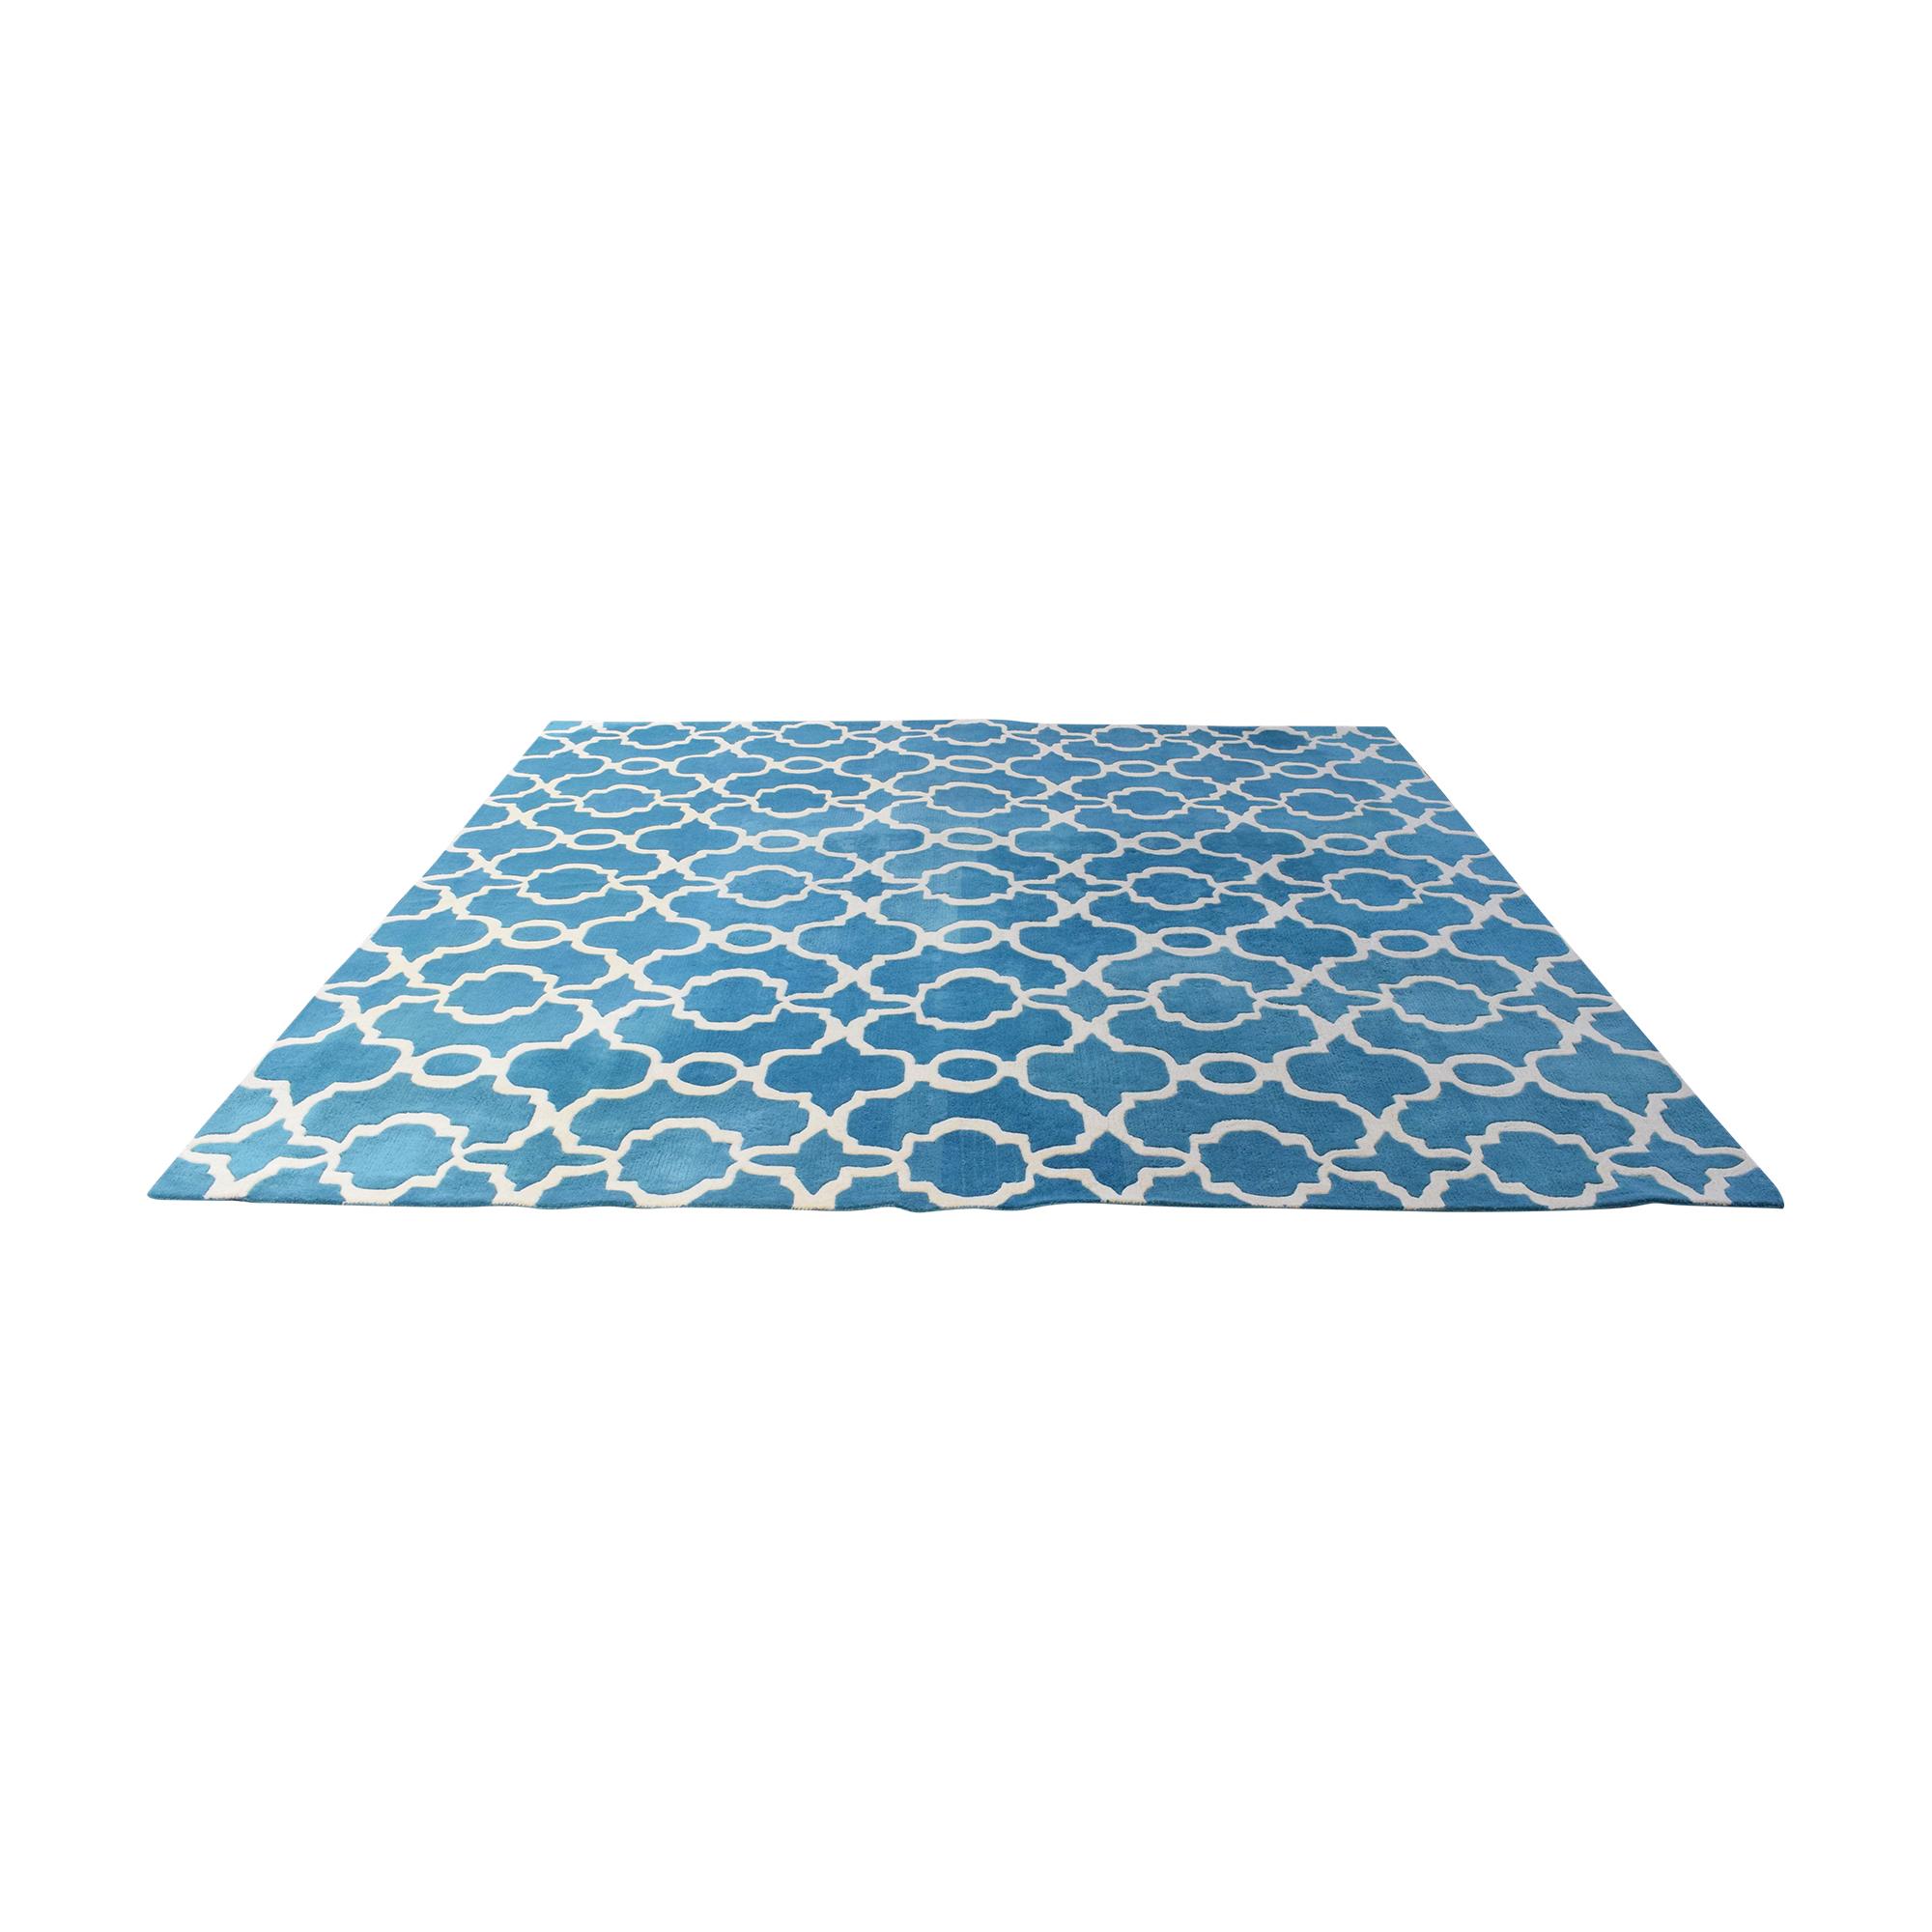 Kaleen Cosmopolitan Trellis Large Square Rug / Decor